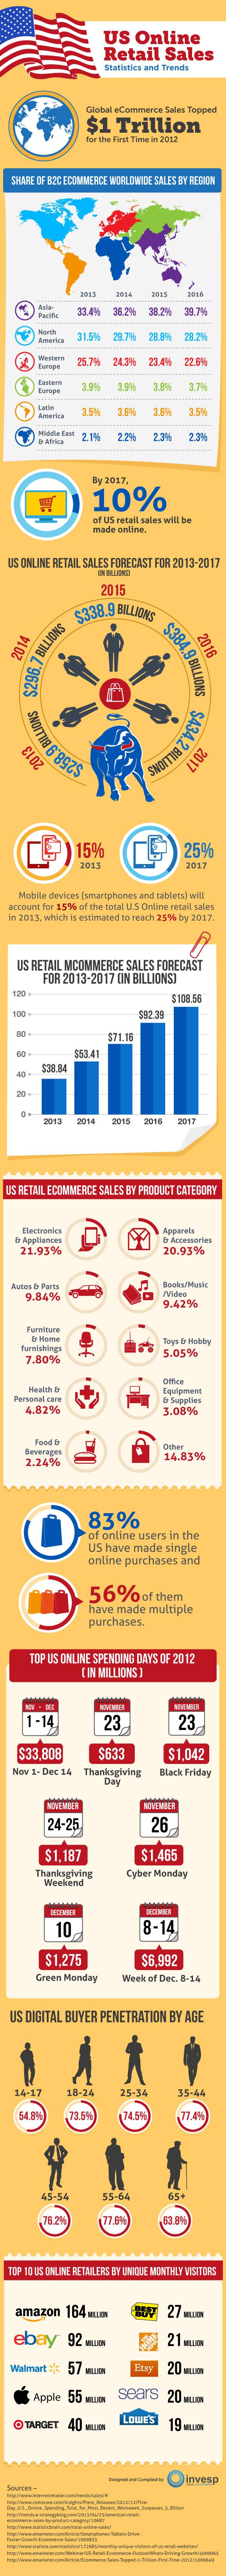 US Online Retail Sales